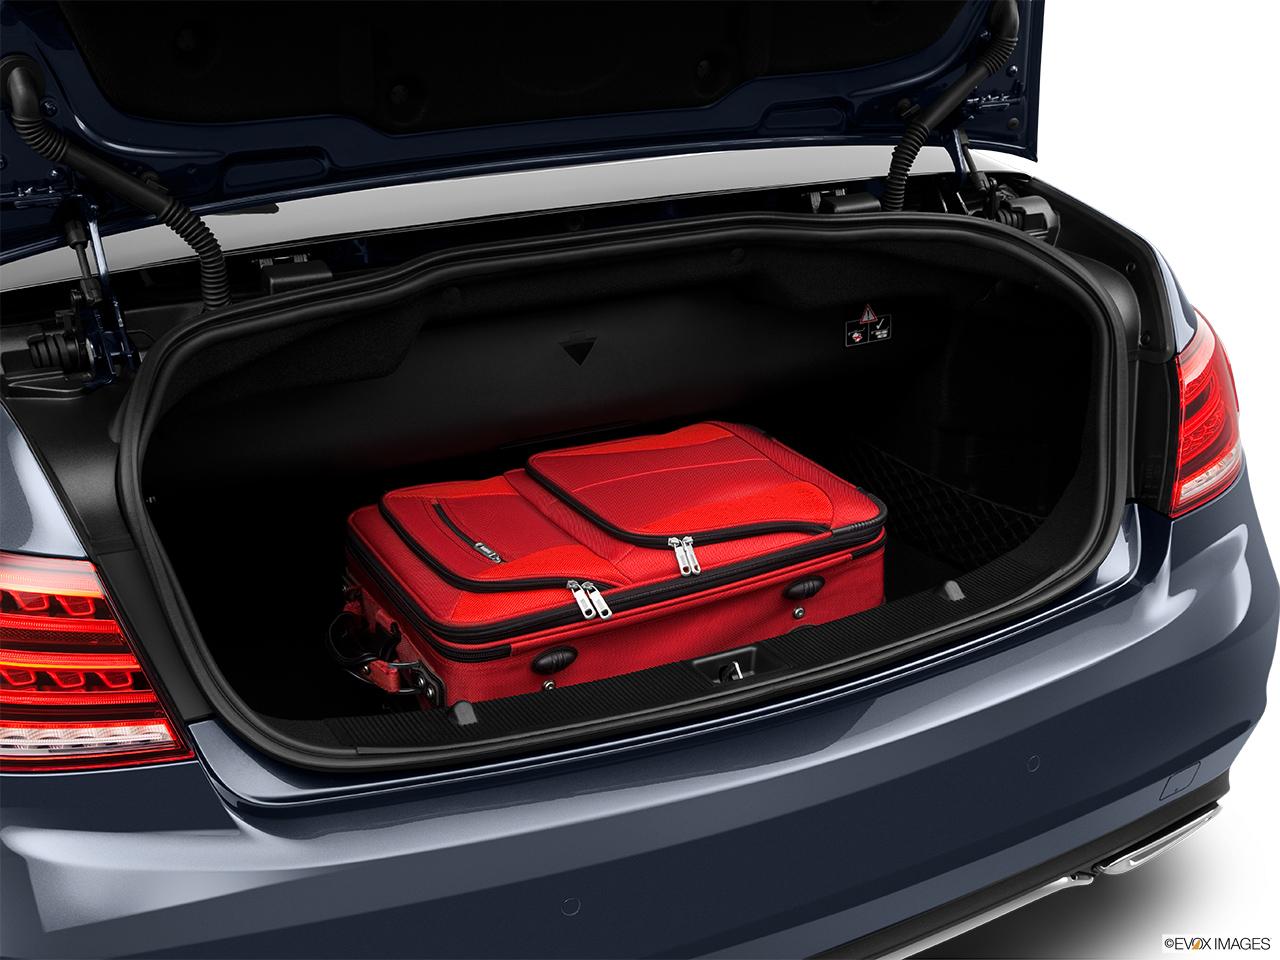 2014 mercedesbenz eclass cabriolet e350 rwd trunk props